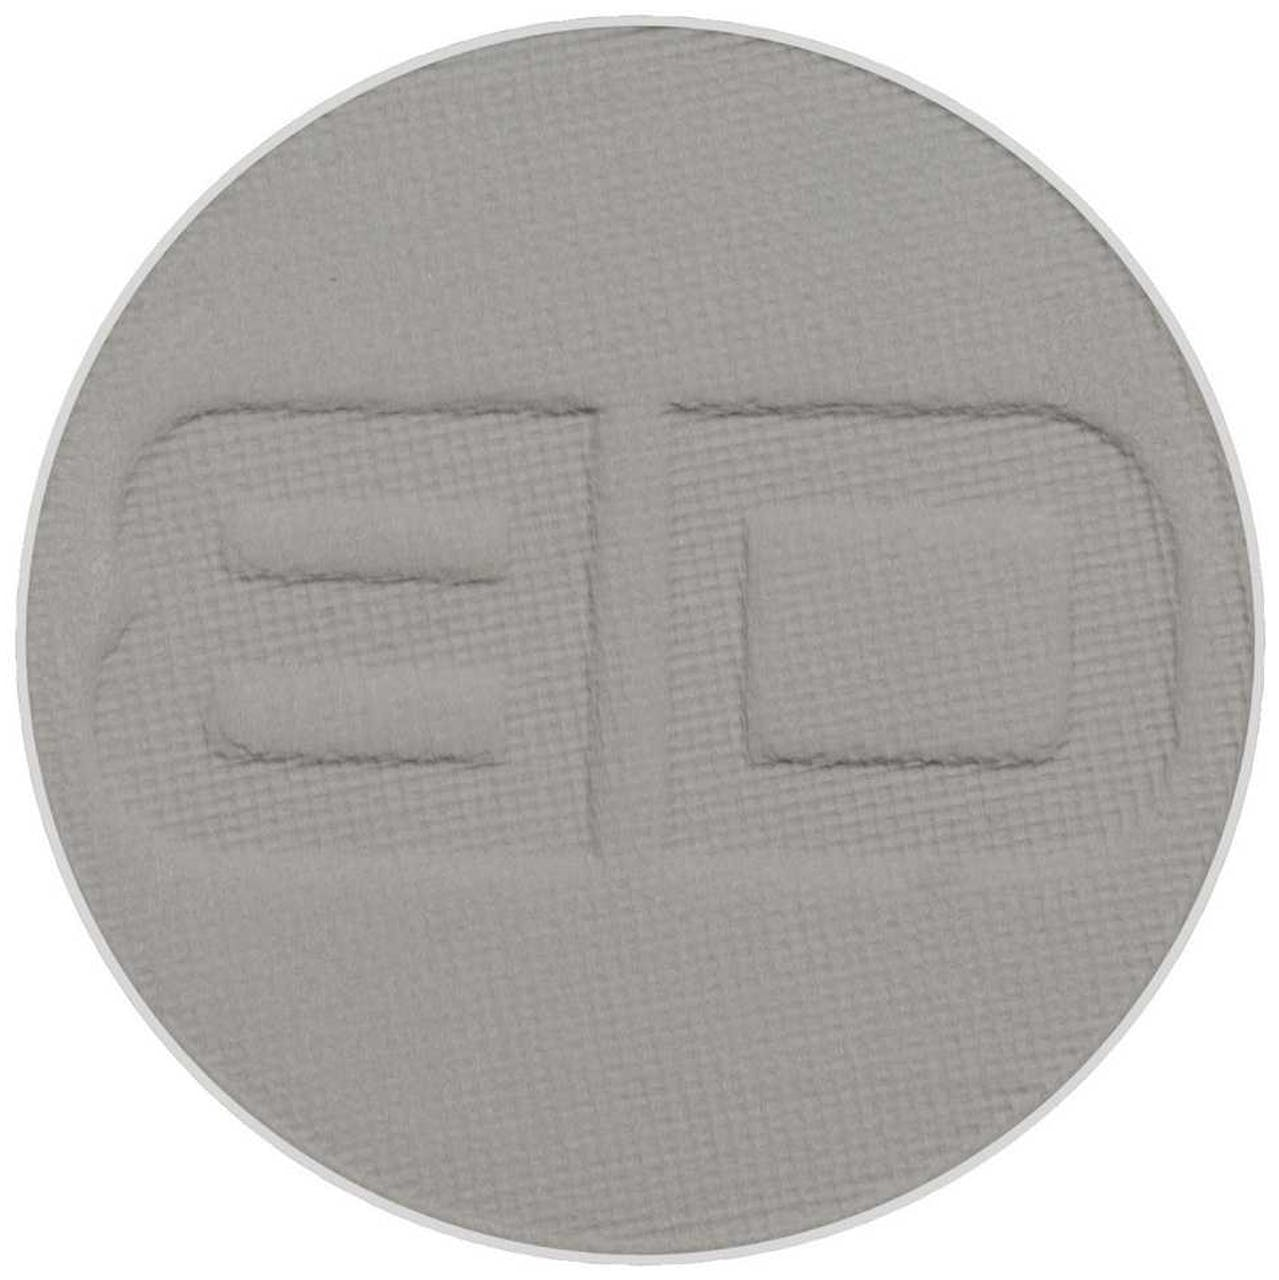 BD Puderpigment Stein Refill - 2.5g - 5.40€/1g